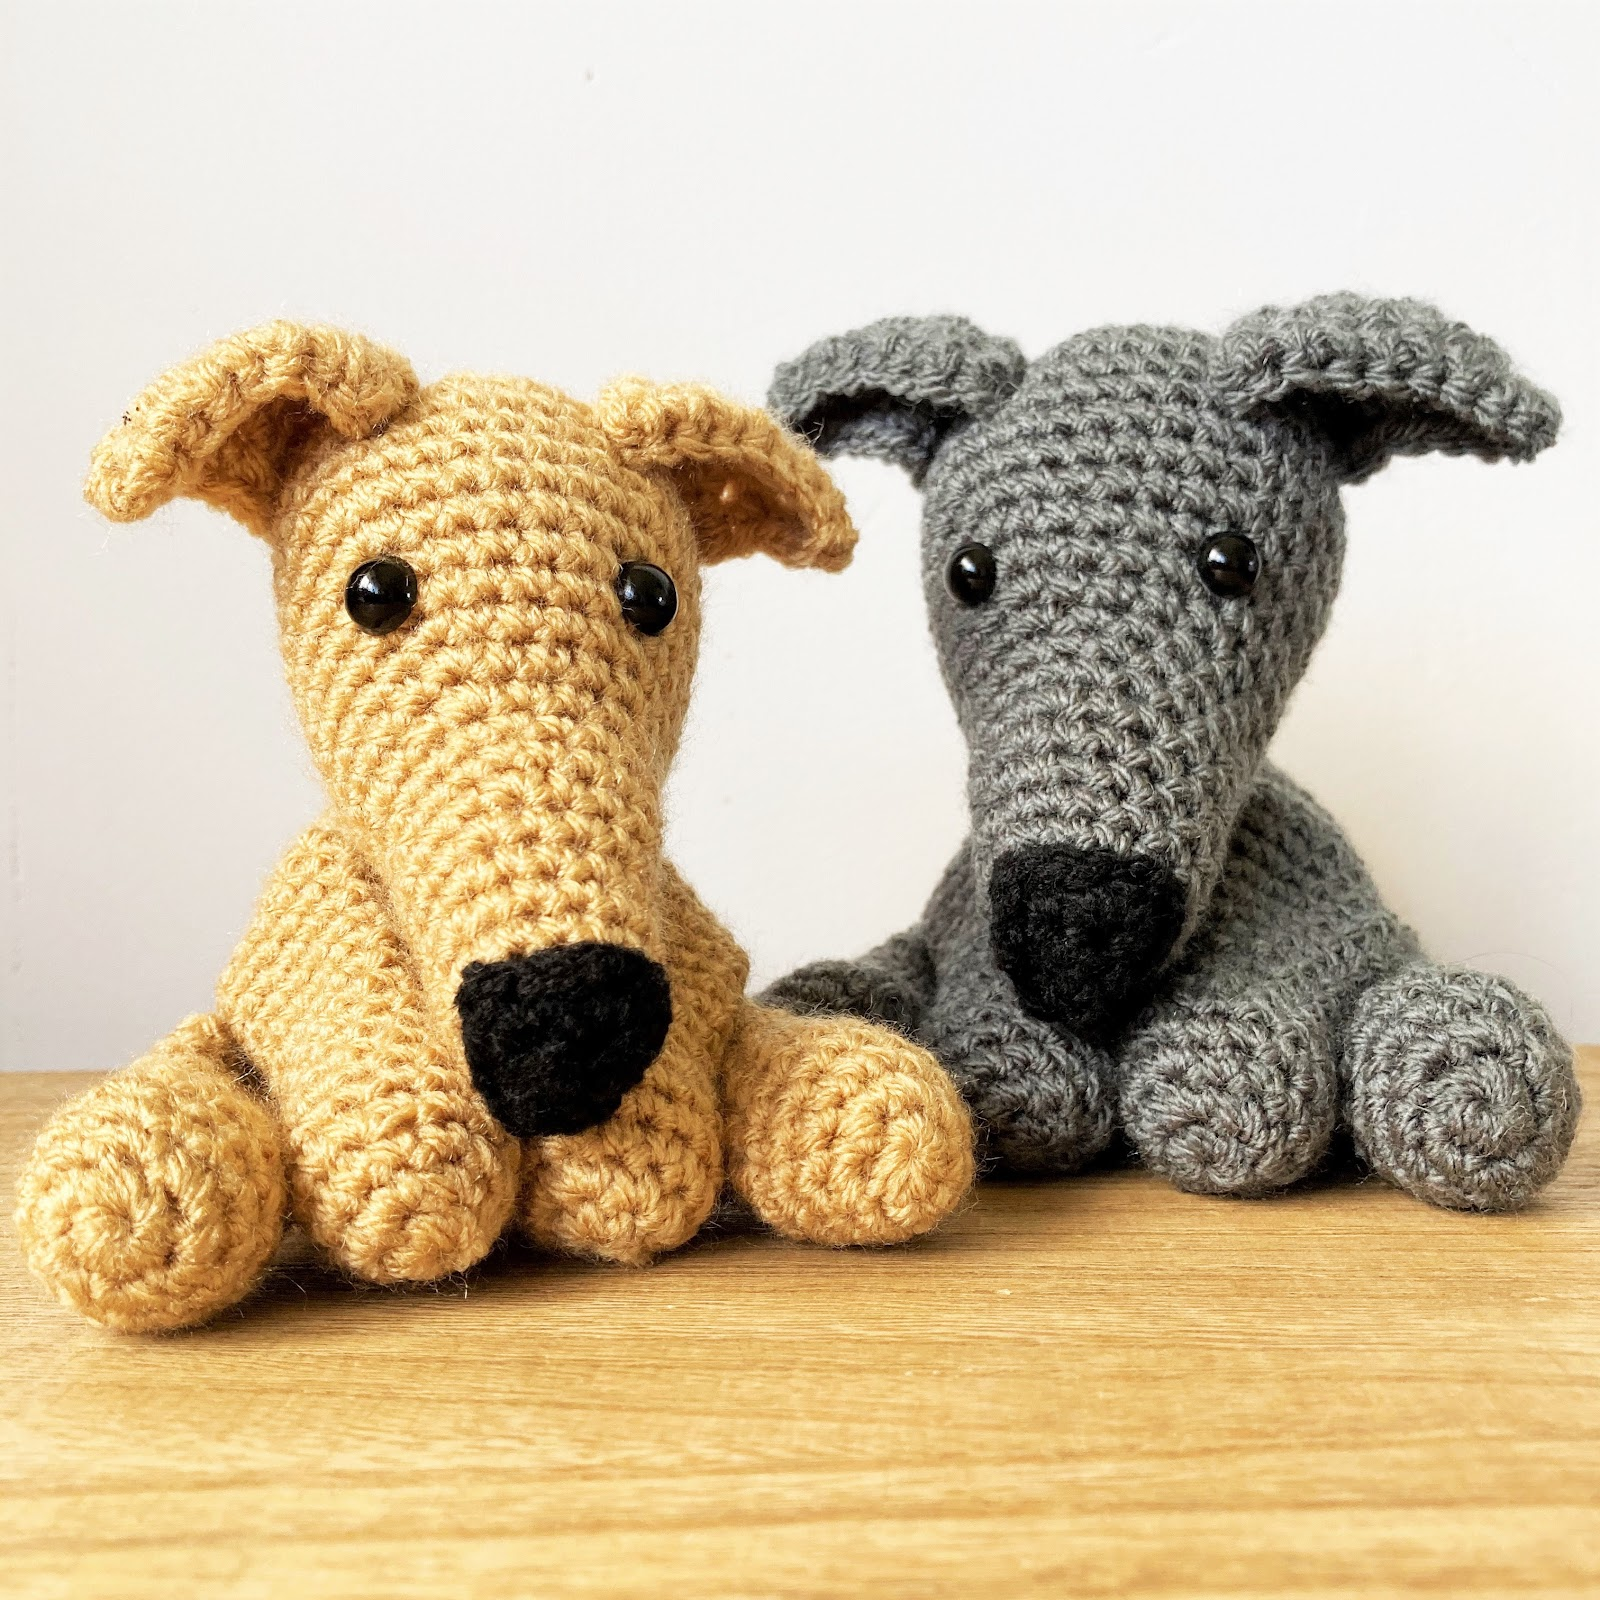 crochet Christmas gift idea - amigurumi